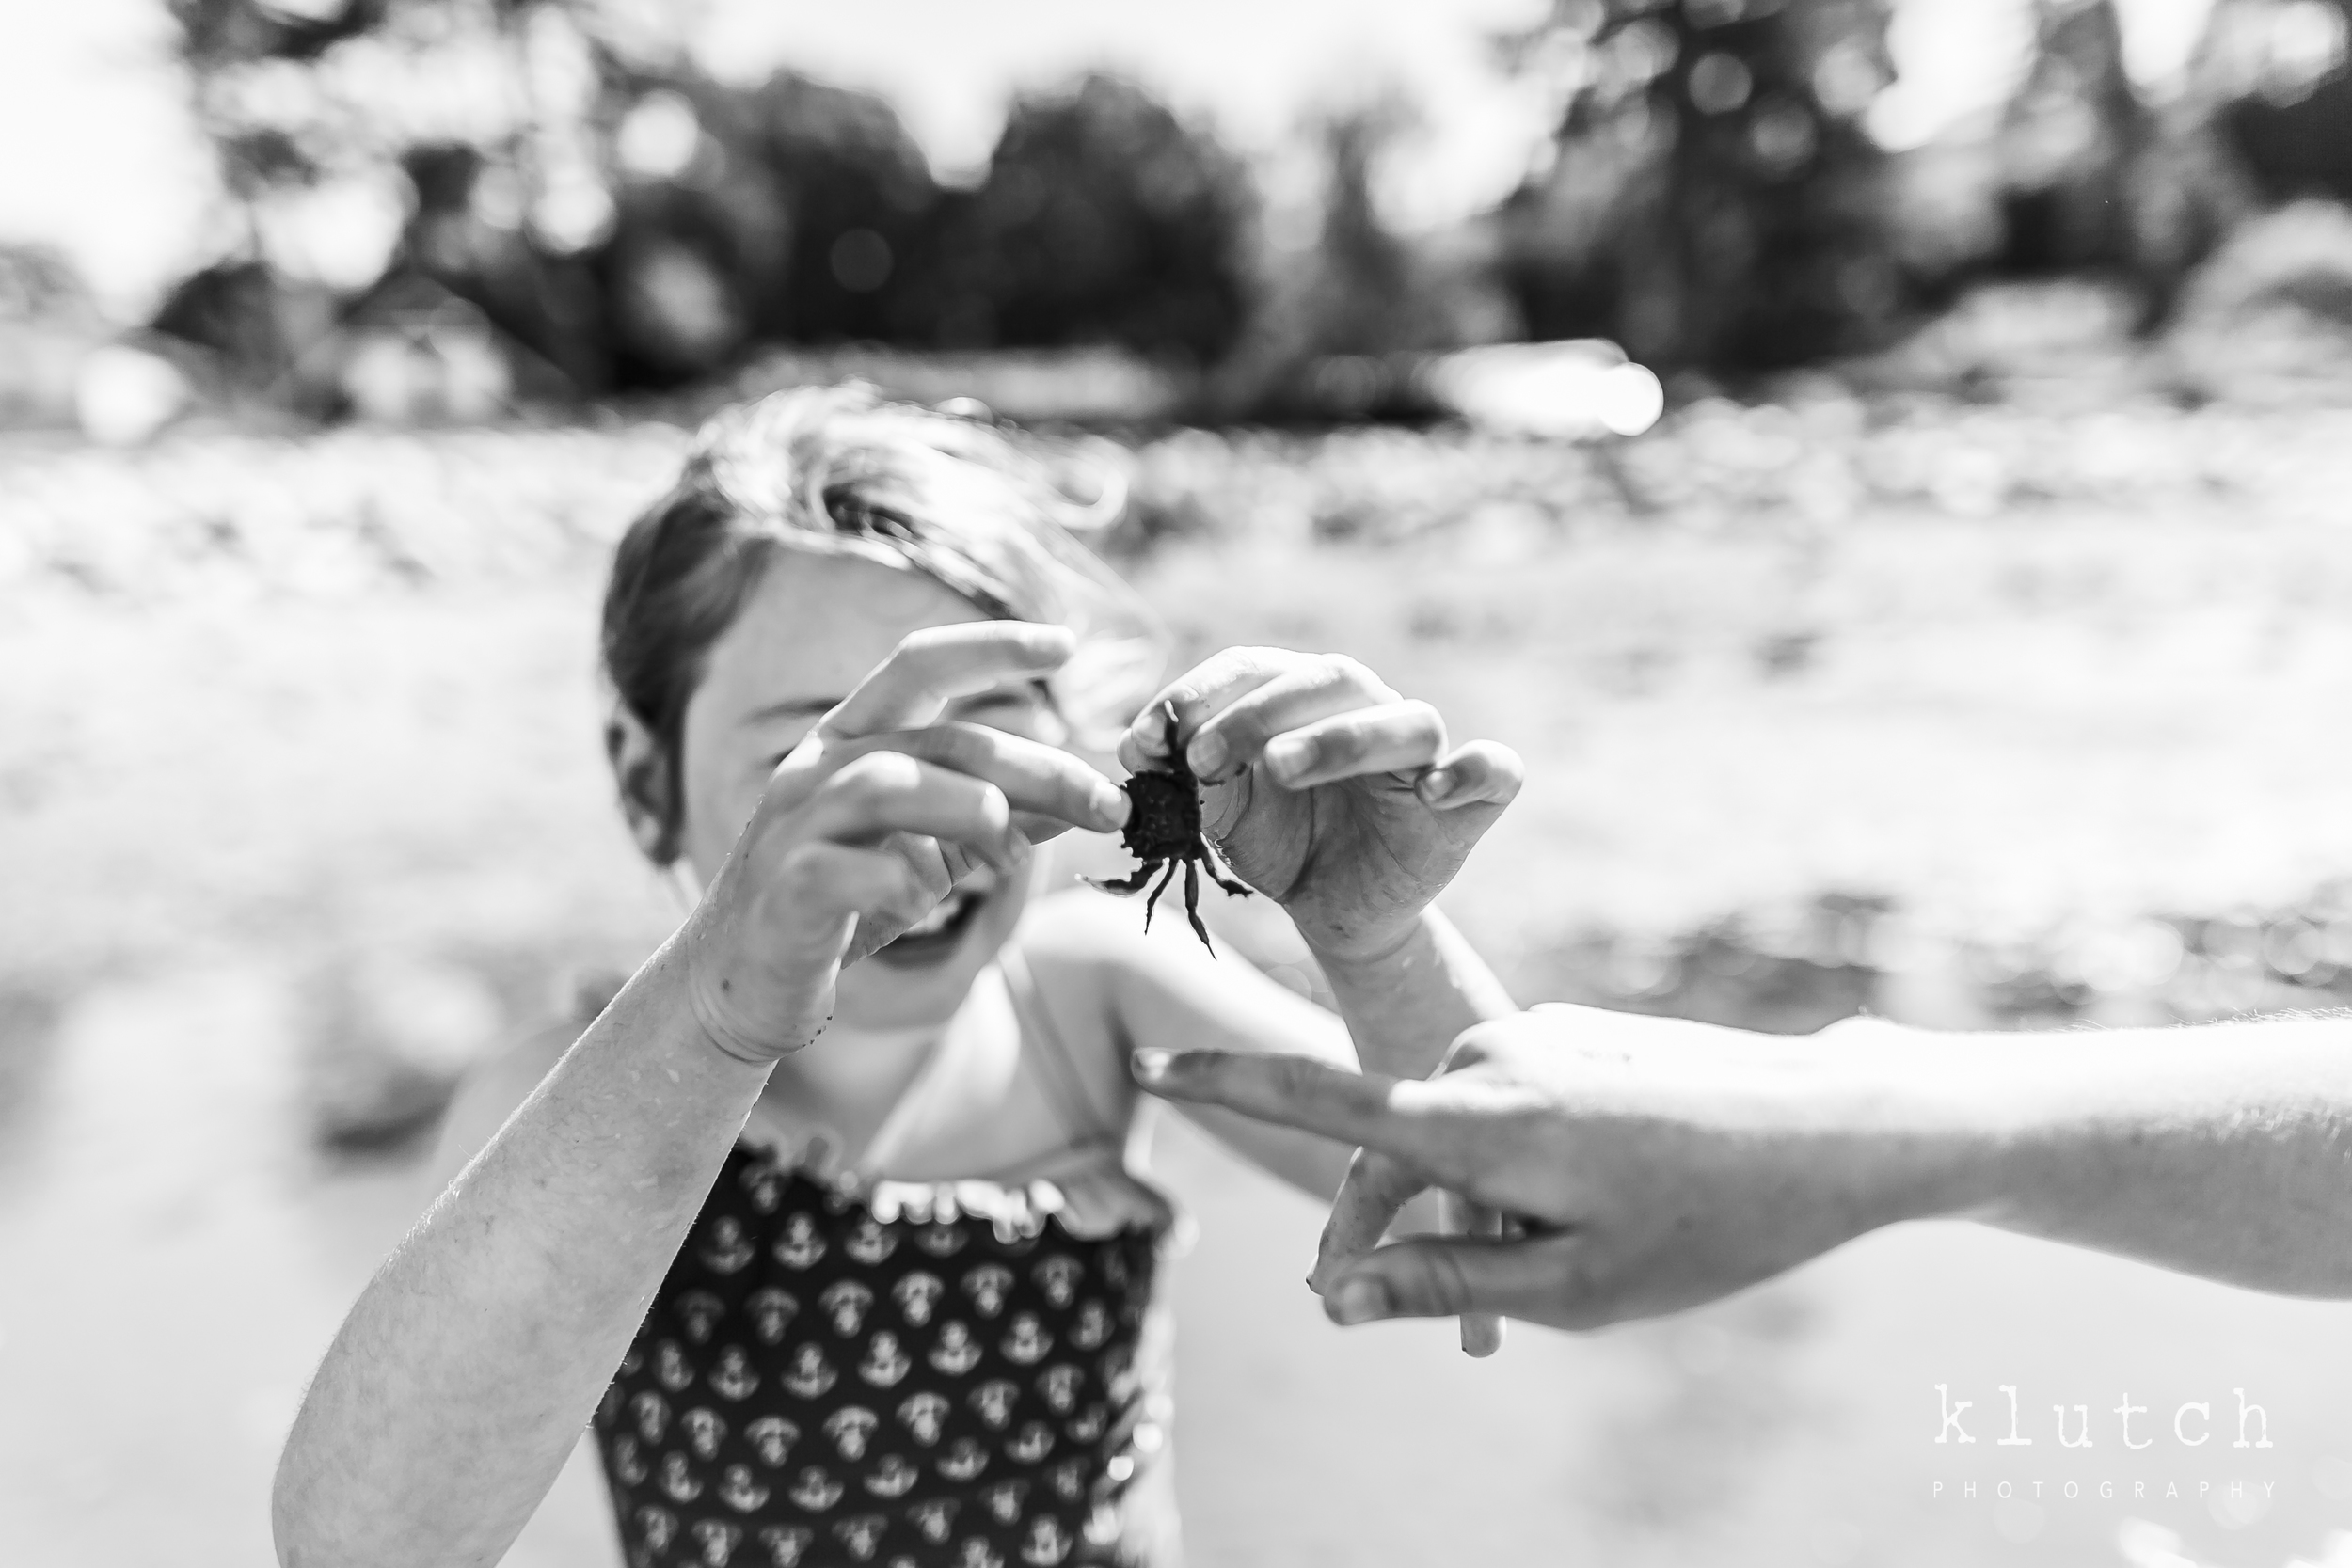 Klutch Photography,white rock family photographer, vancouver family photographer, whiterock lifestyle photographer, life unscripted photographer, life unscripted session, photography,Dina Ferreira Stoddard-5594-2.jpg